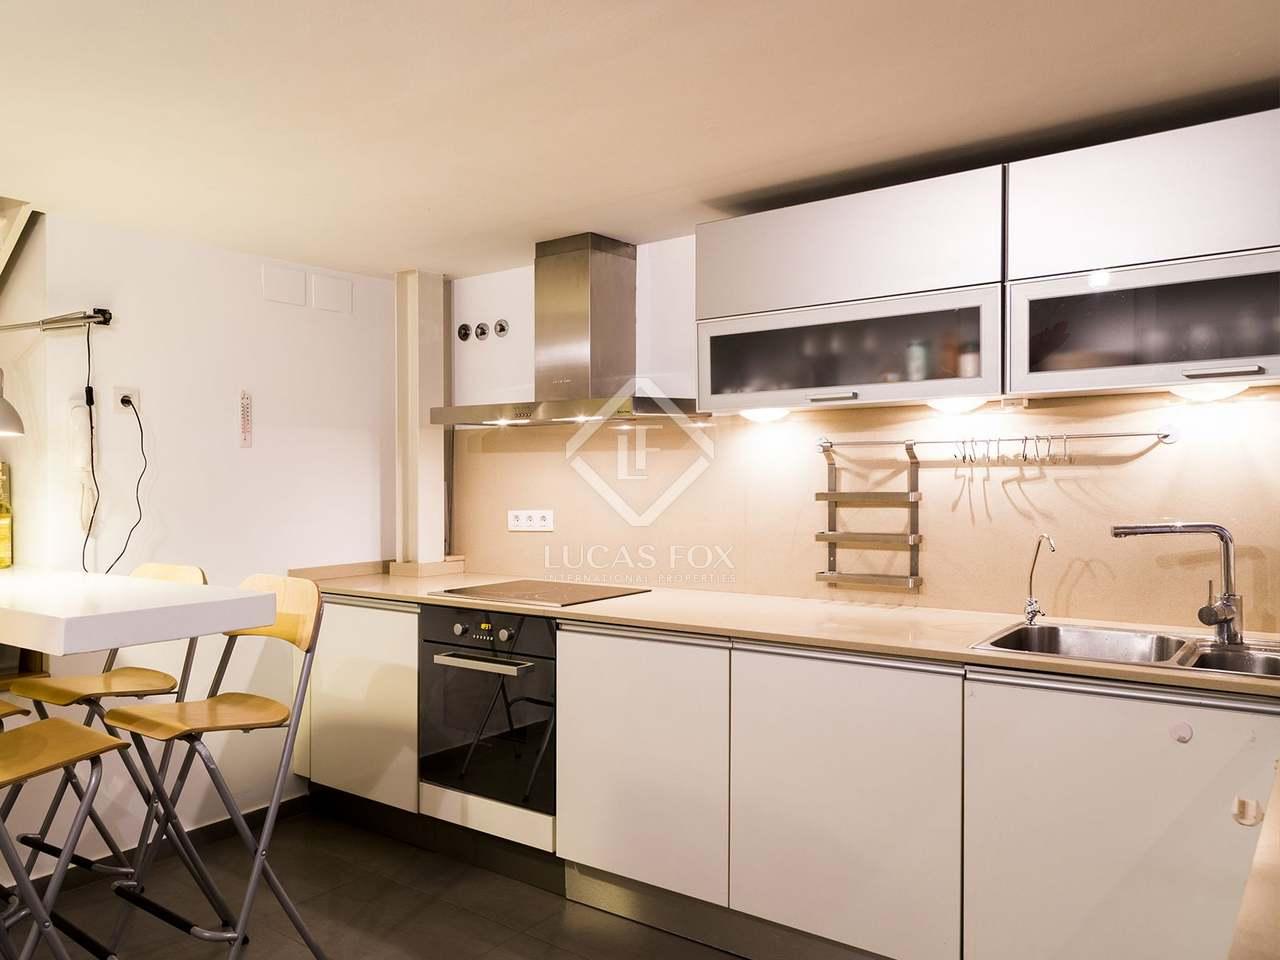 Incroyable loft en vente barcelone - Appartement vente barcelone ...